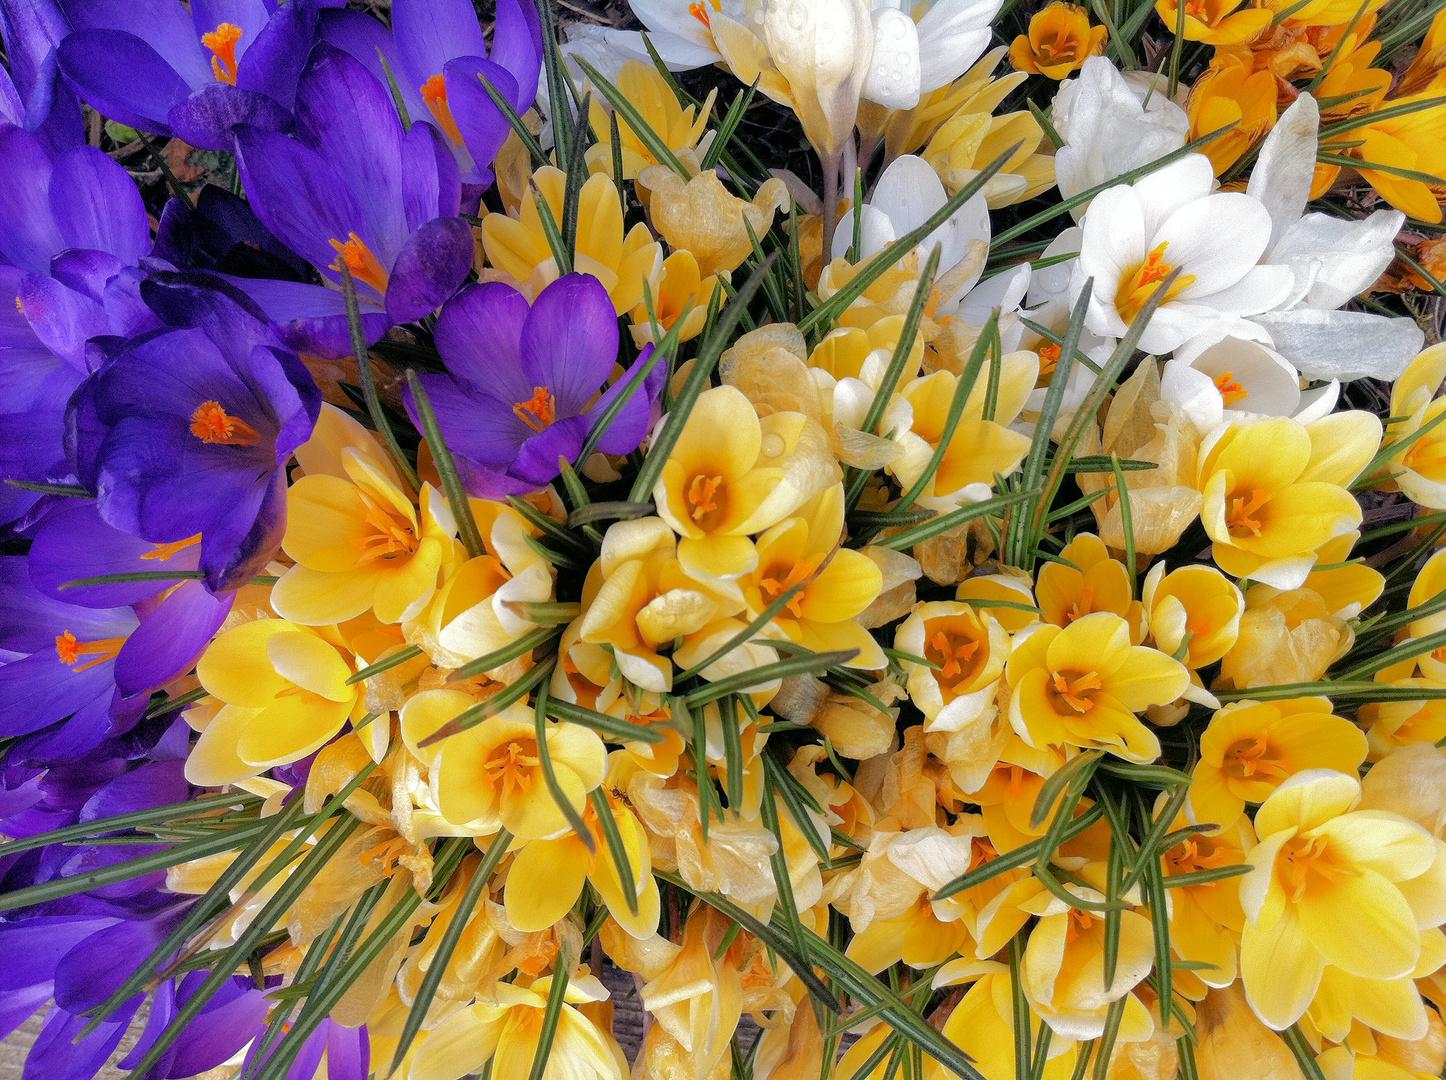 Farbenpracht im Frühling